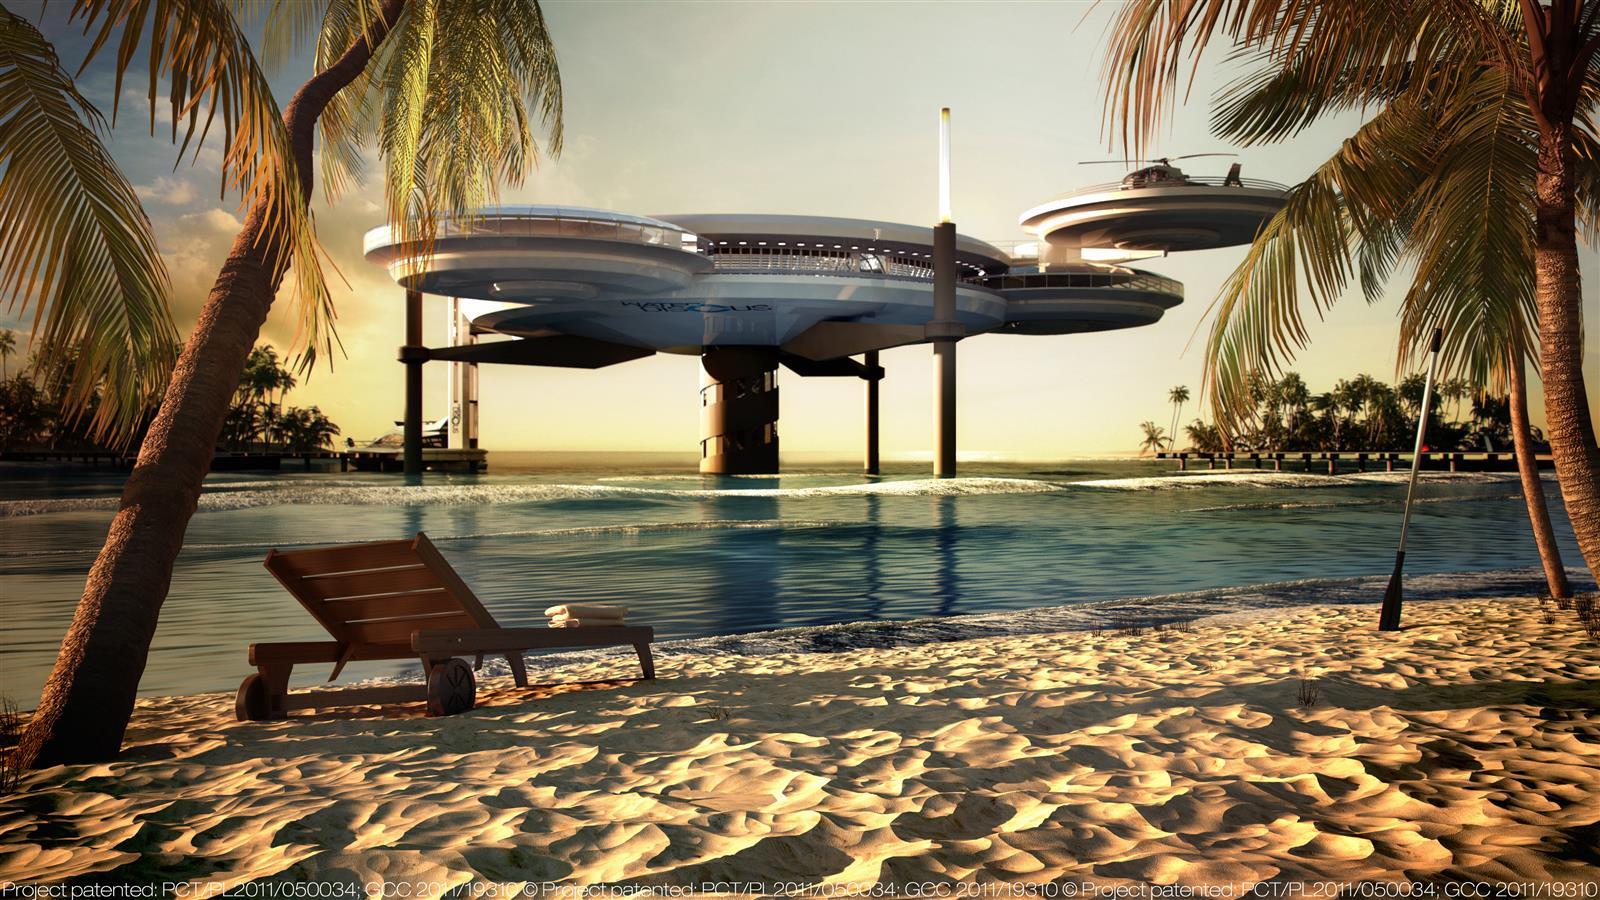 Water Discus Underwater Hotels In Dubai (5)